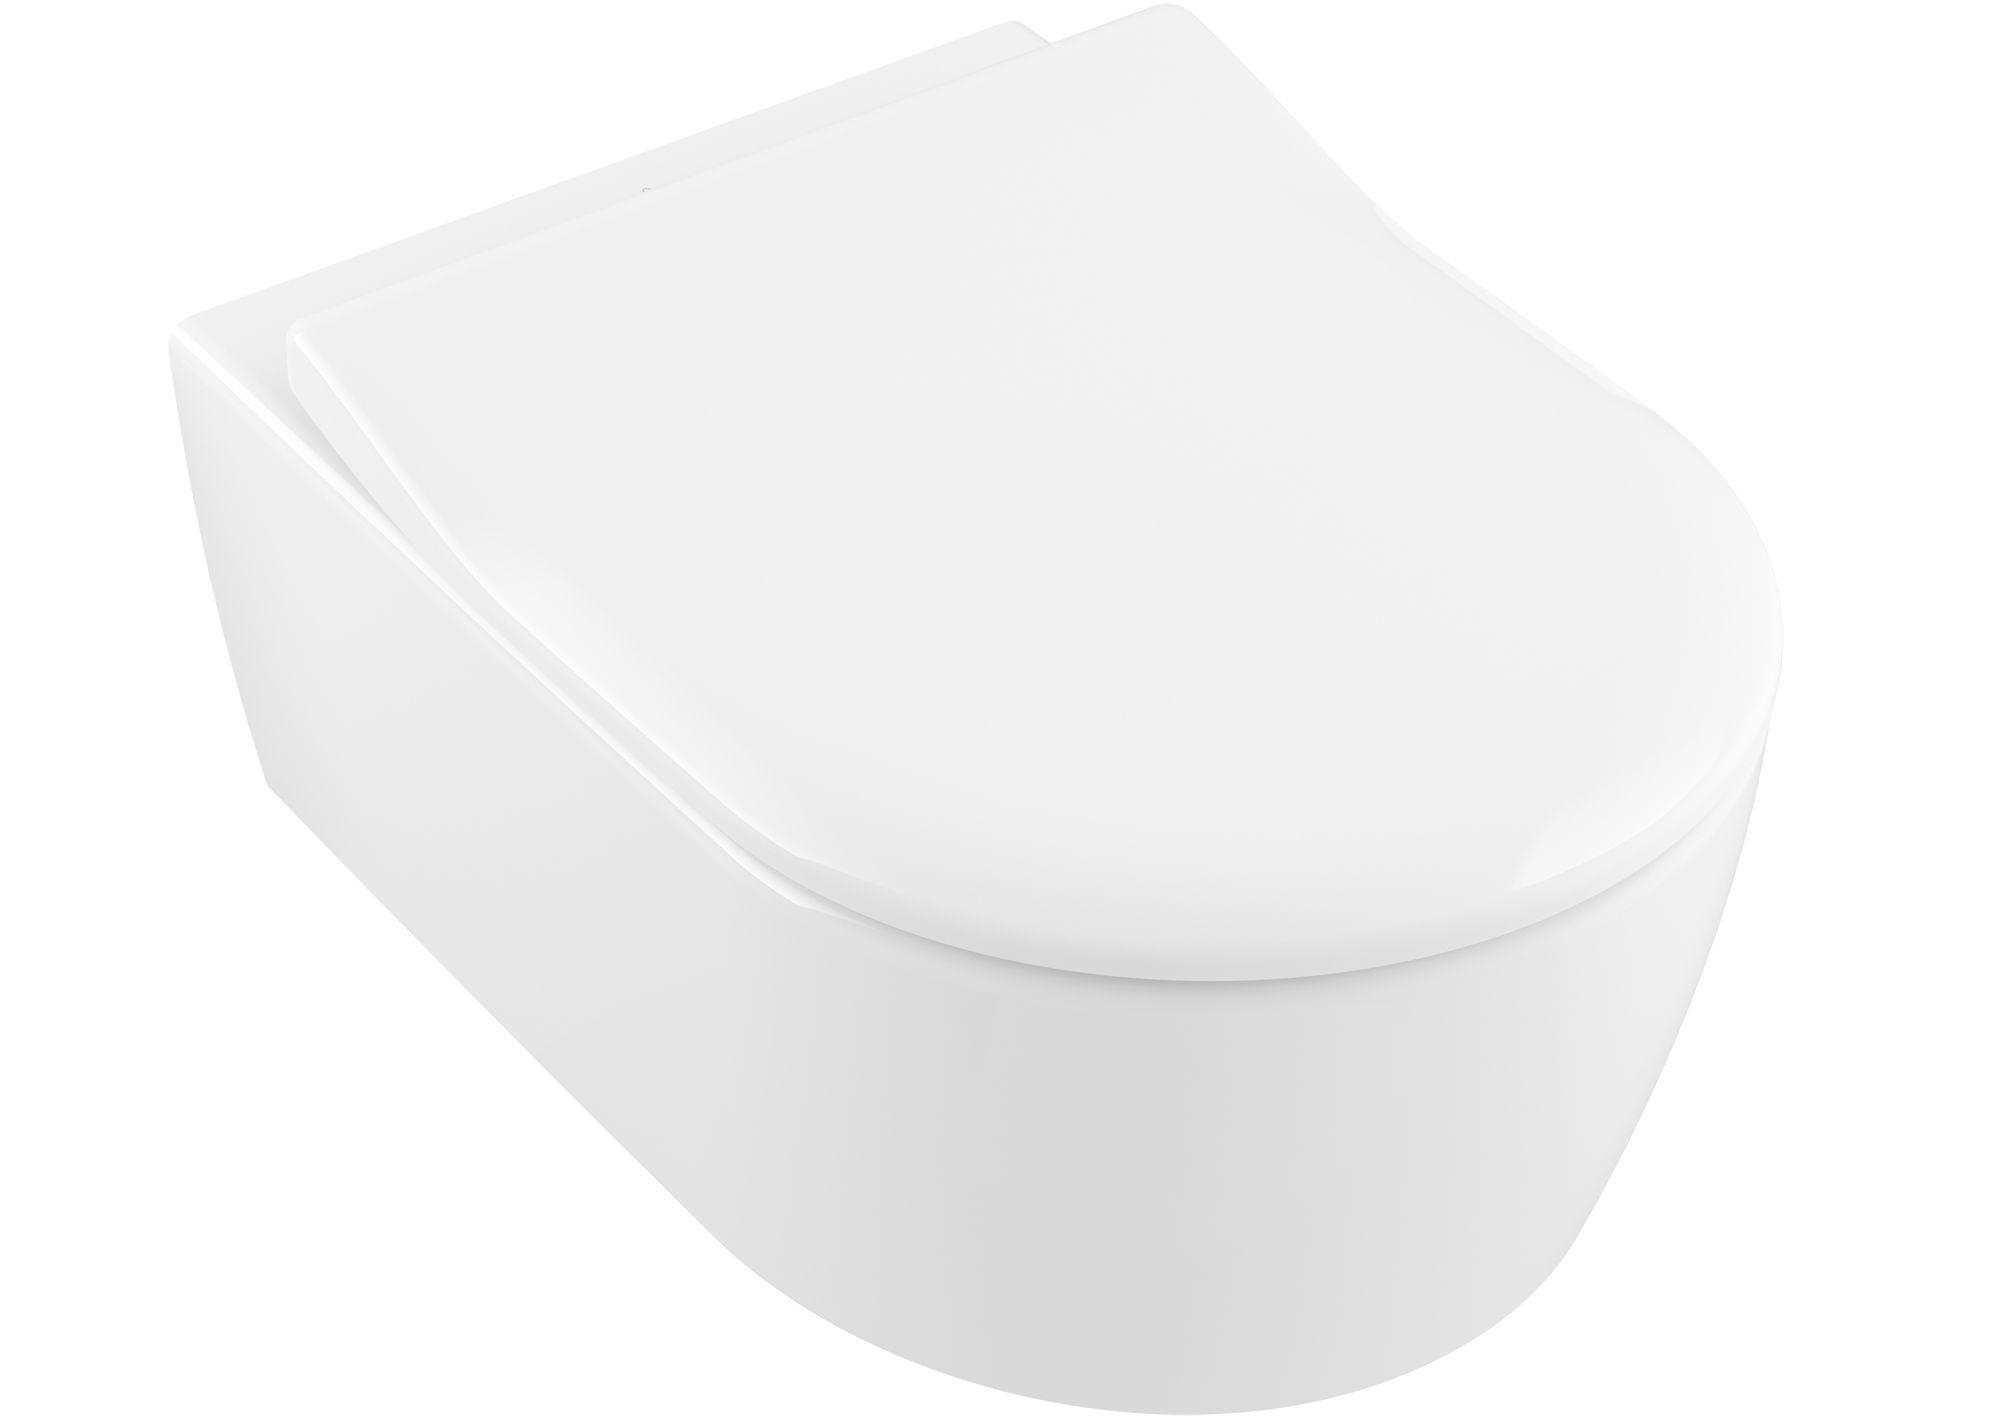 Villeroy & Boch Avento Combi-Pack mit Wand-Tiefspül-WC DirectFlush mit offenem Spülrand L:53xB:37cm weiß mit WC-Sitz SlimSeat Absenkautomatik 5656RS01